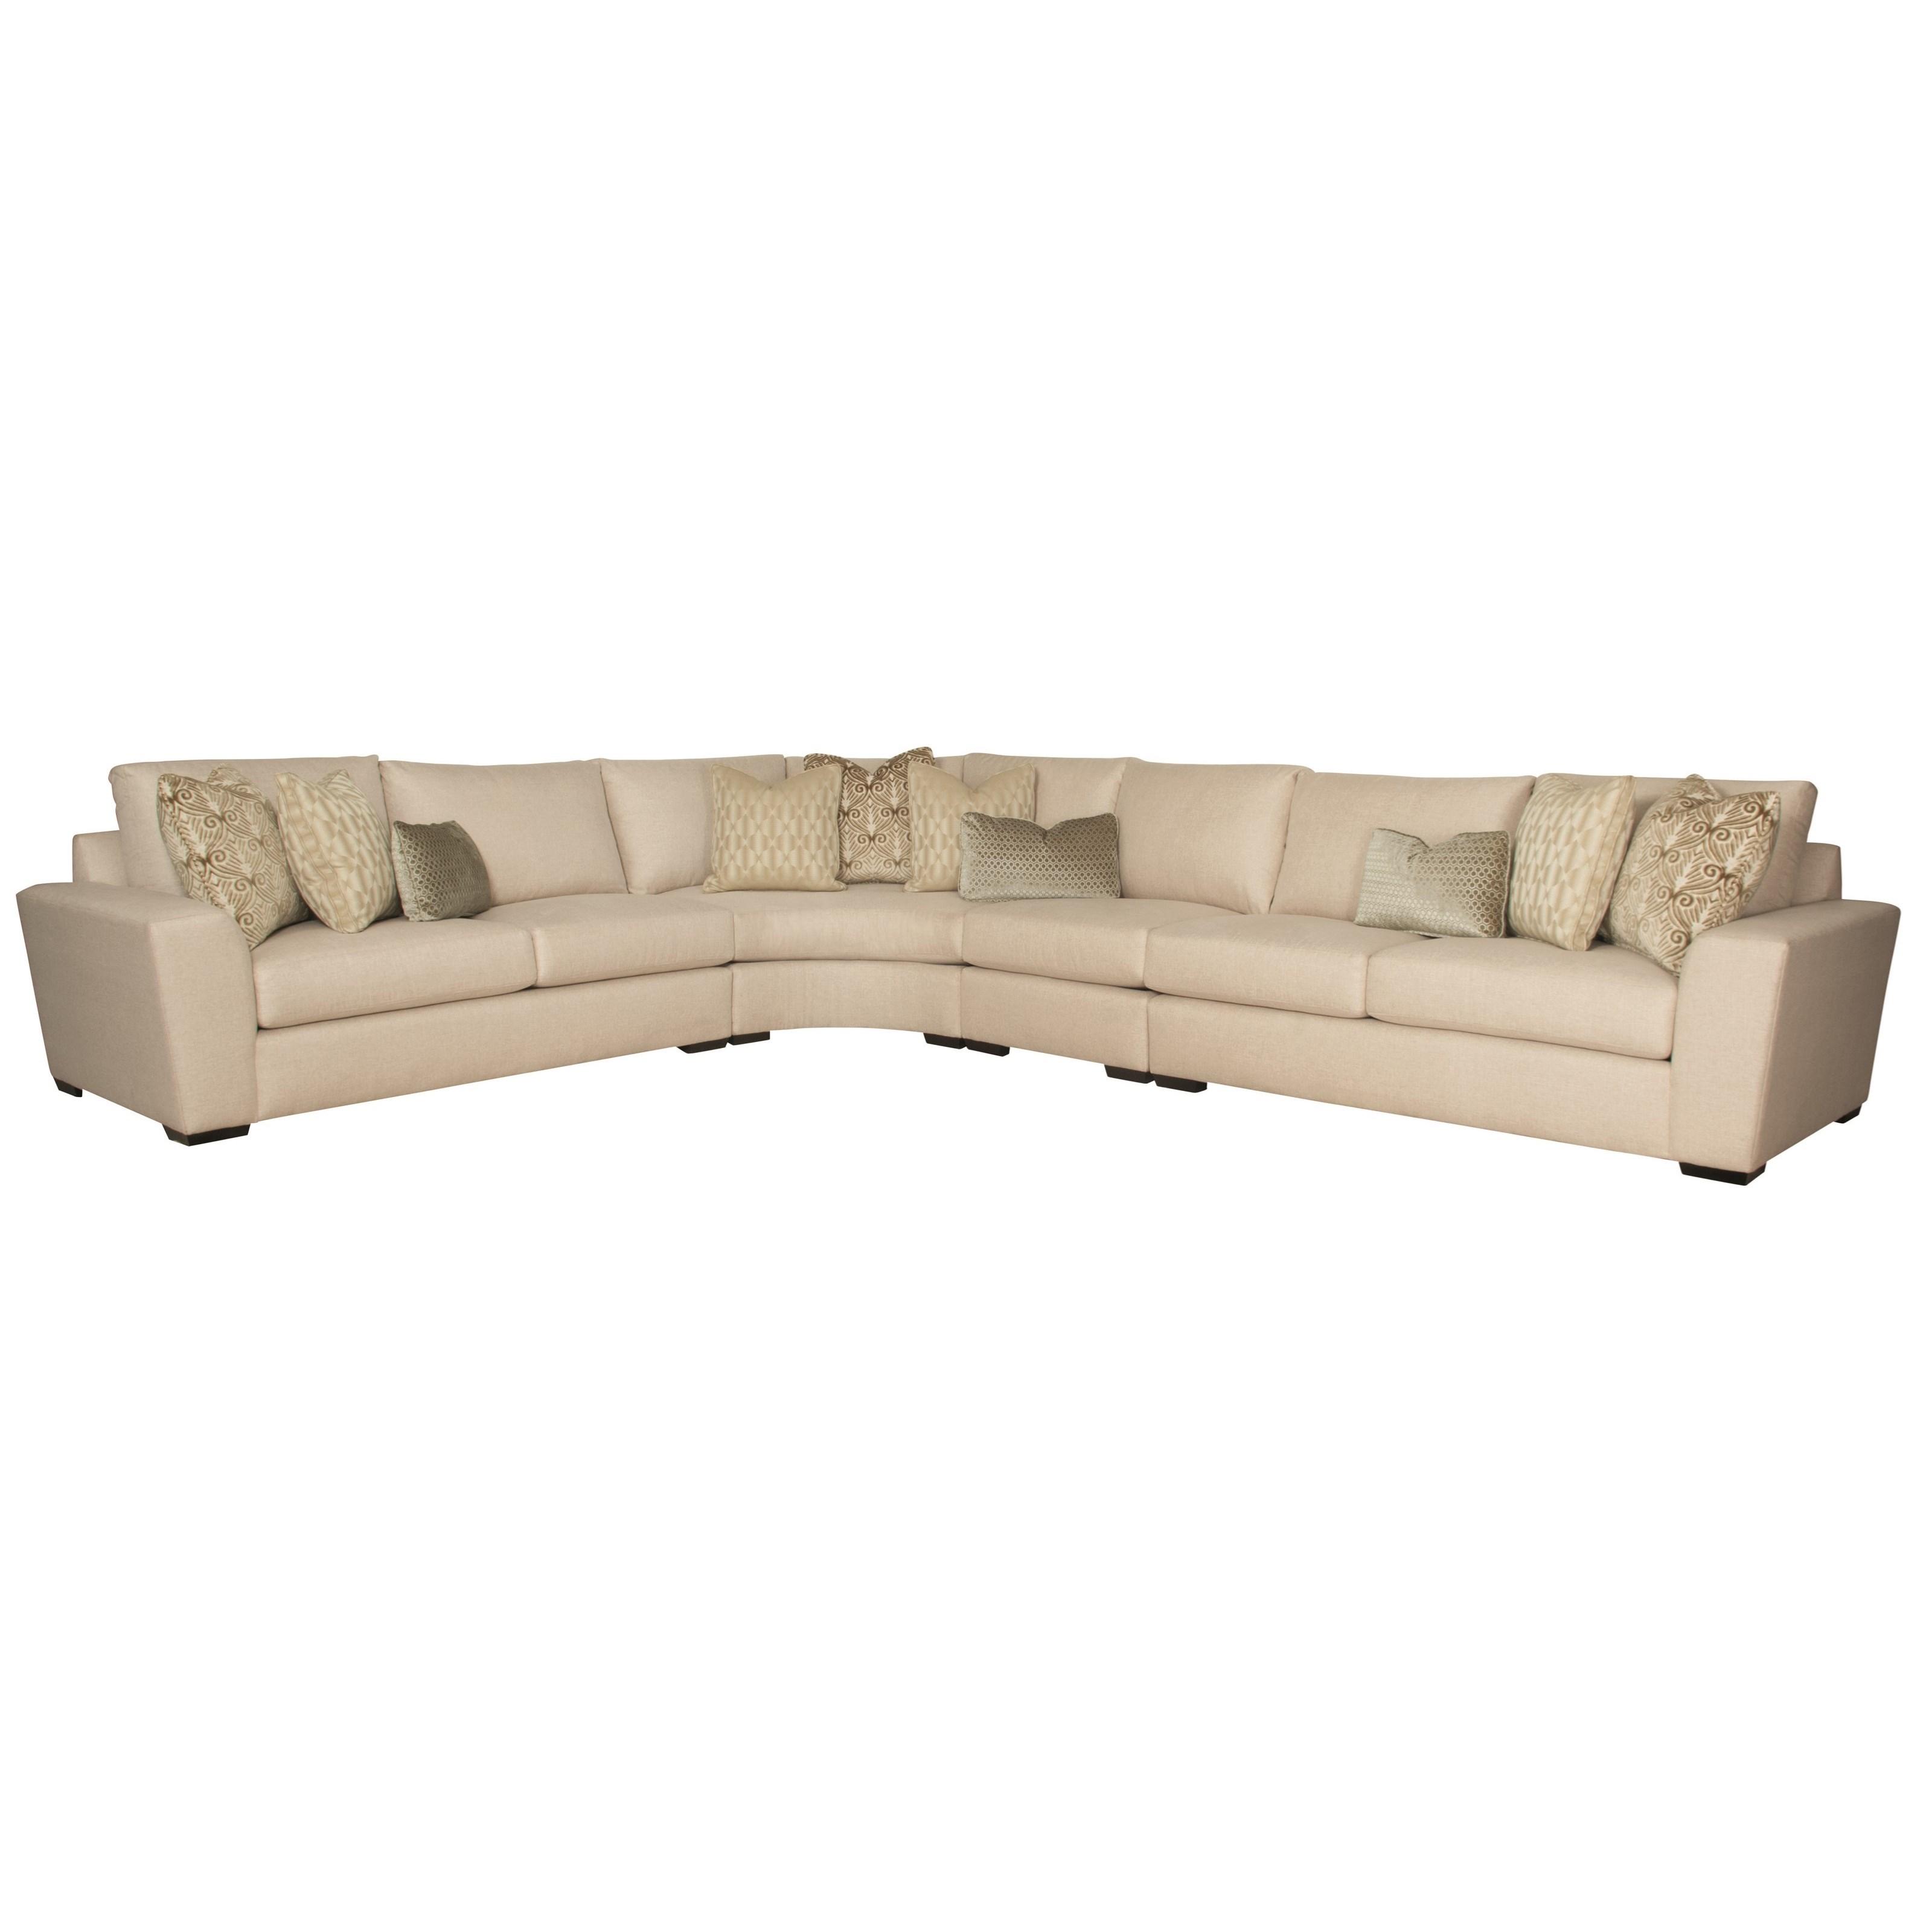 Bernhardt Lockett Sectional Sofa (Seats 6)